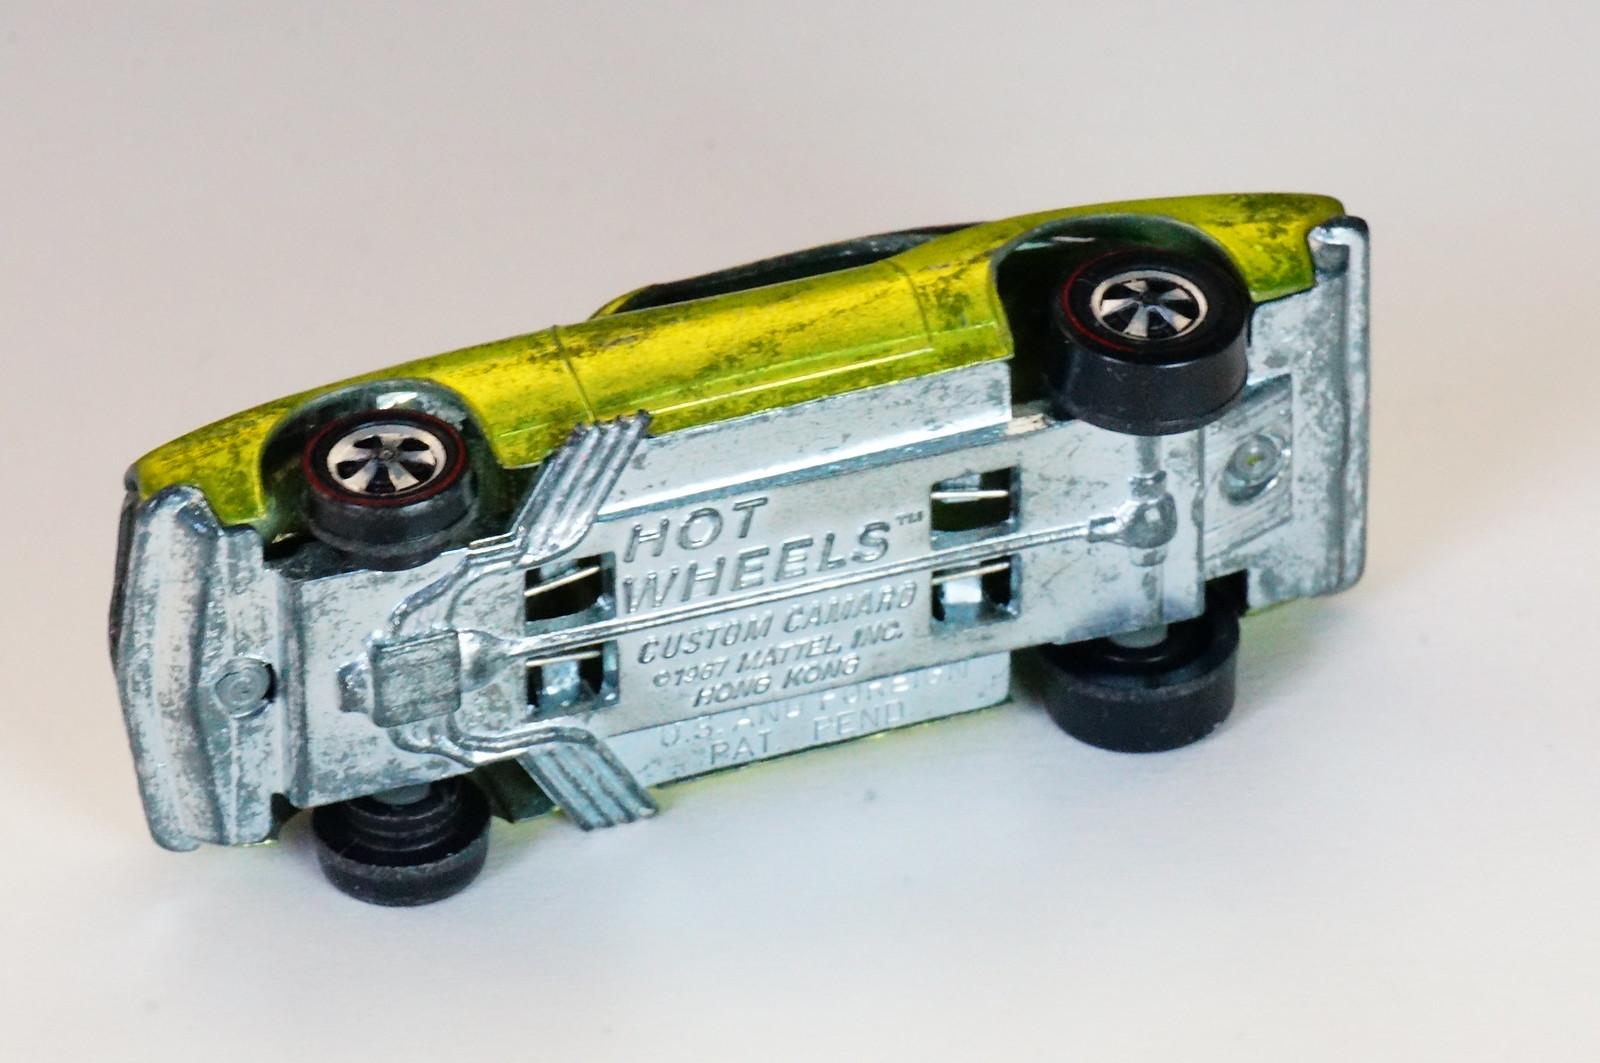 Hot Wheels Redline Anti-Freeze Custom Camaro HK Early Production